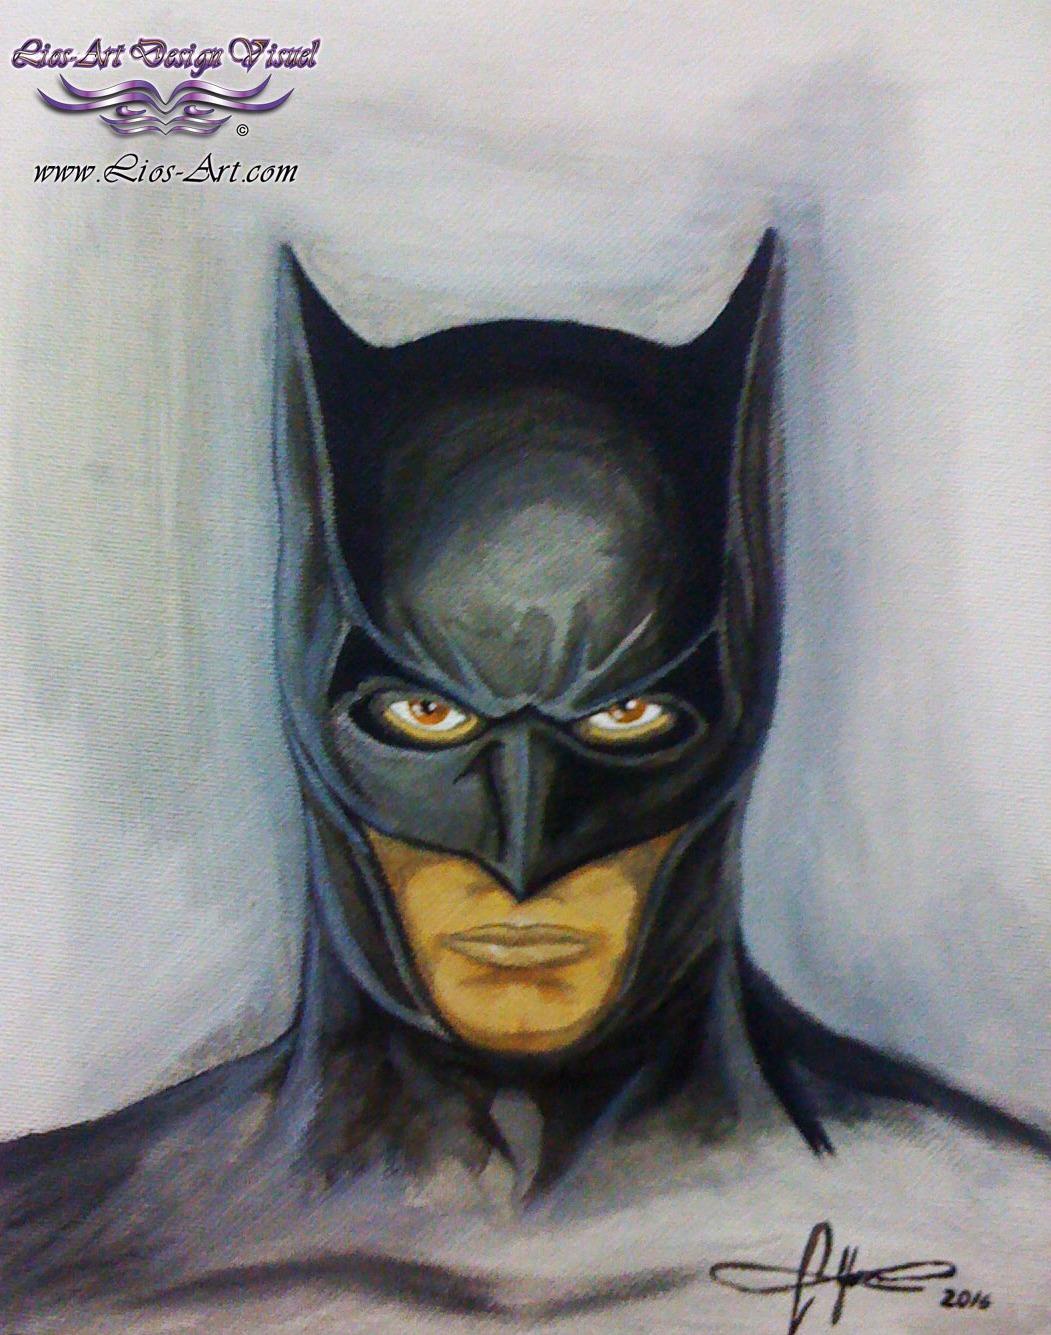 batman-l'exclus_edited.jpg